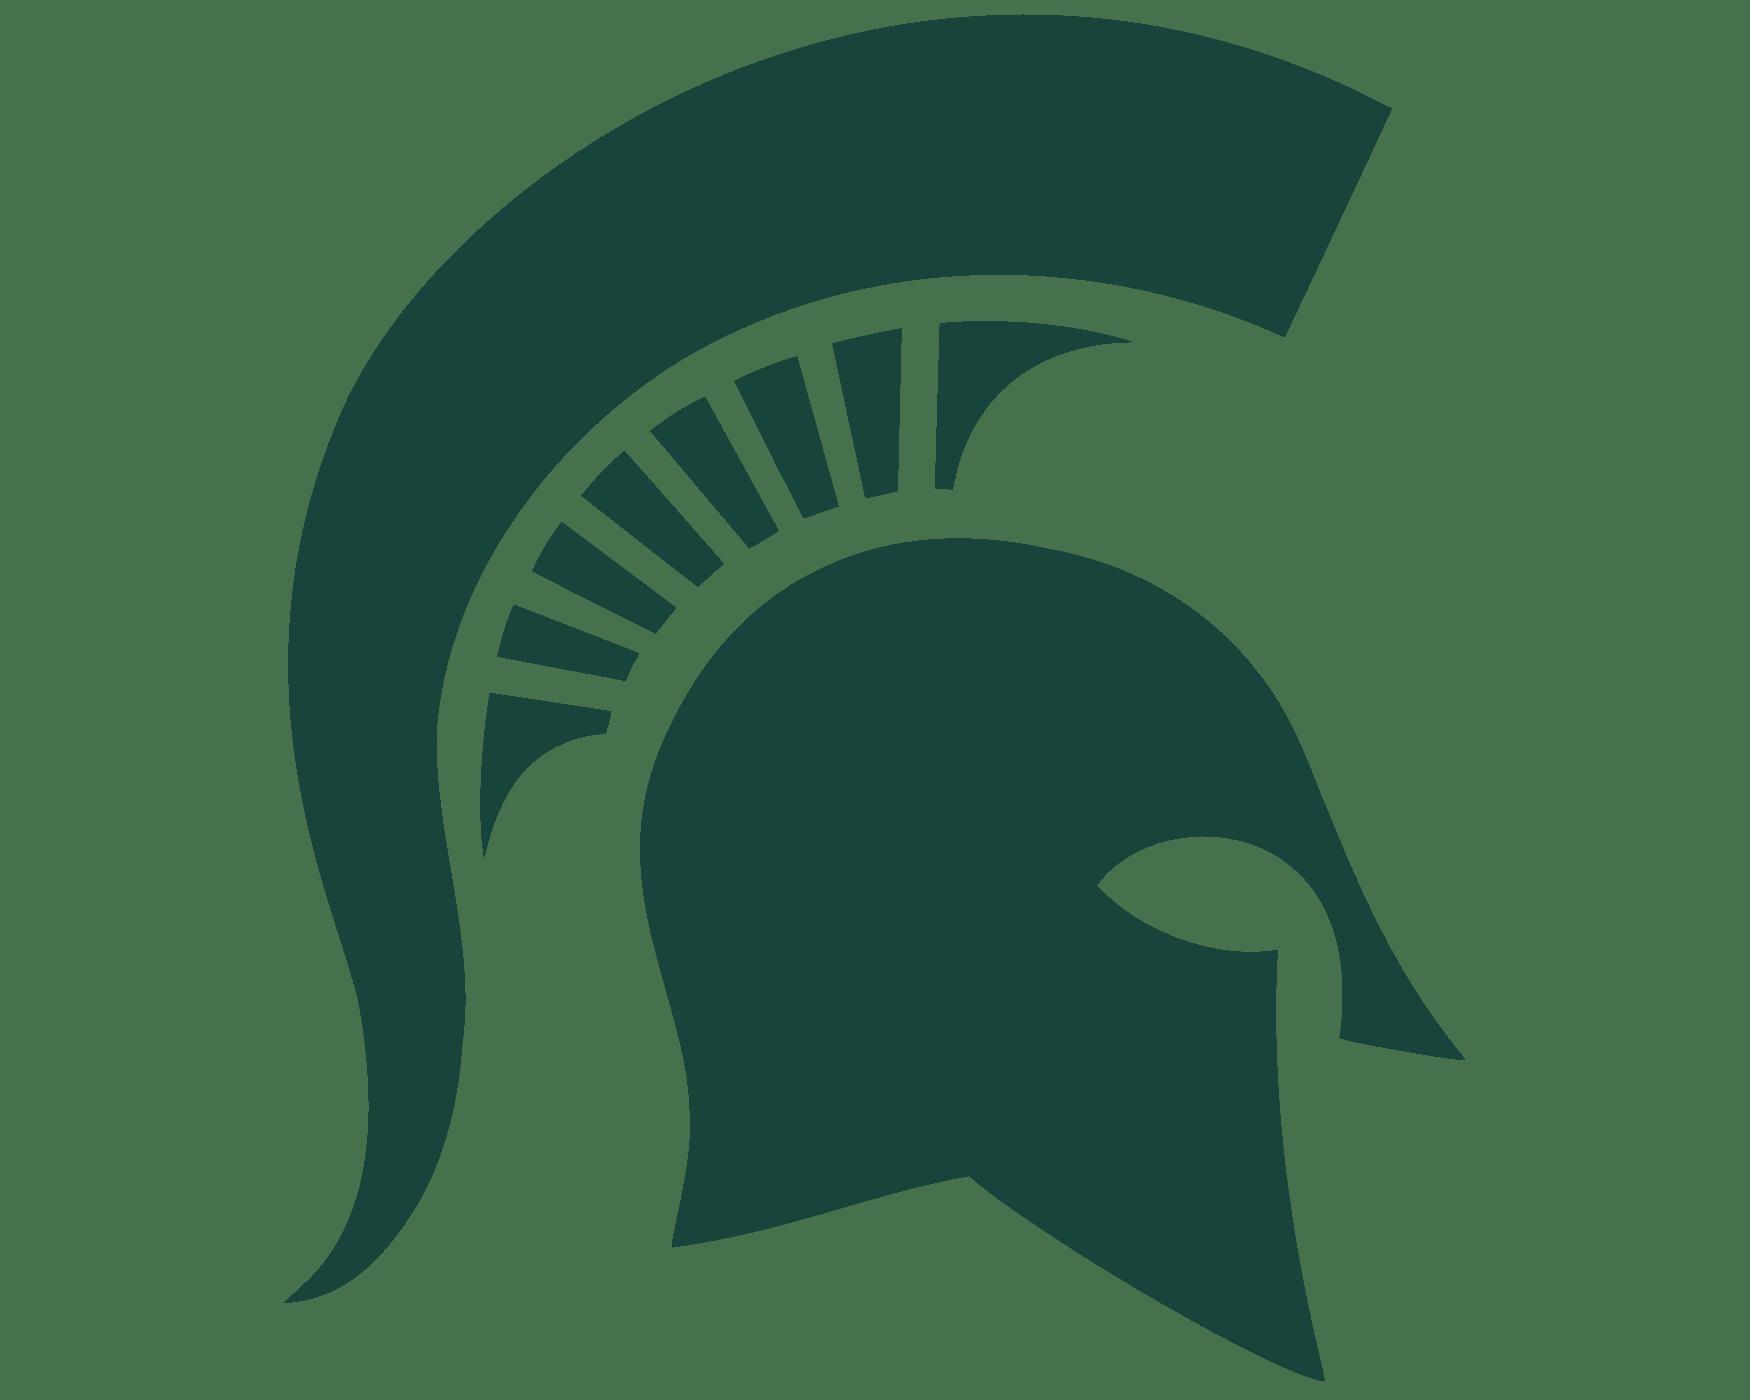 Michigan Logo Michigan Symbol Meaning History And Evolution